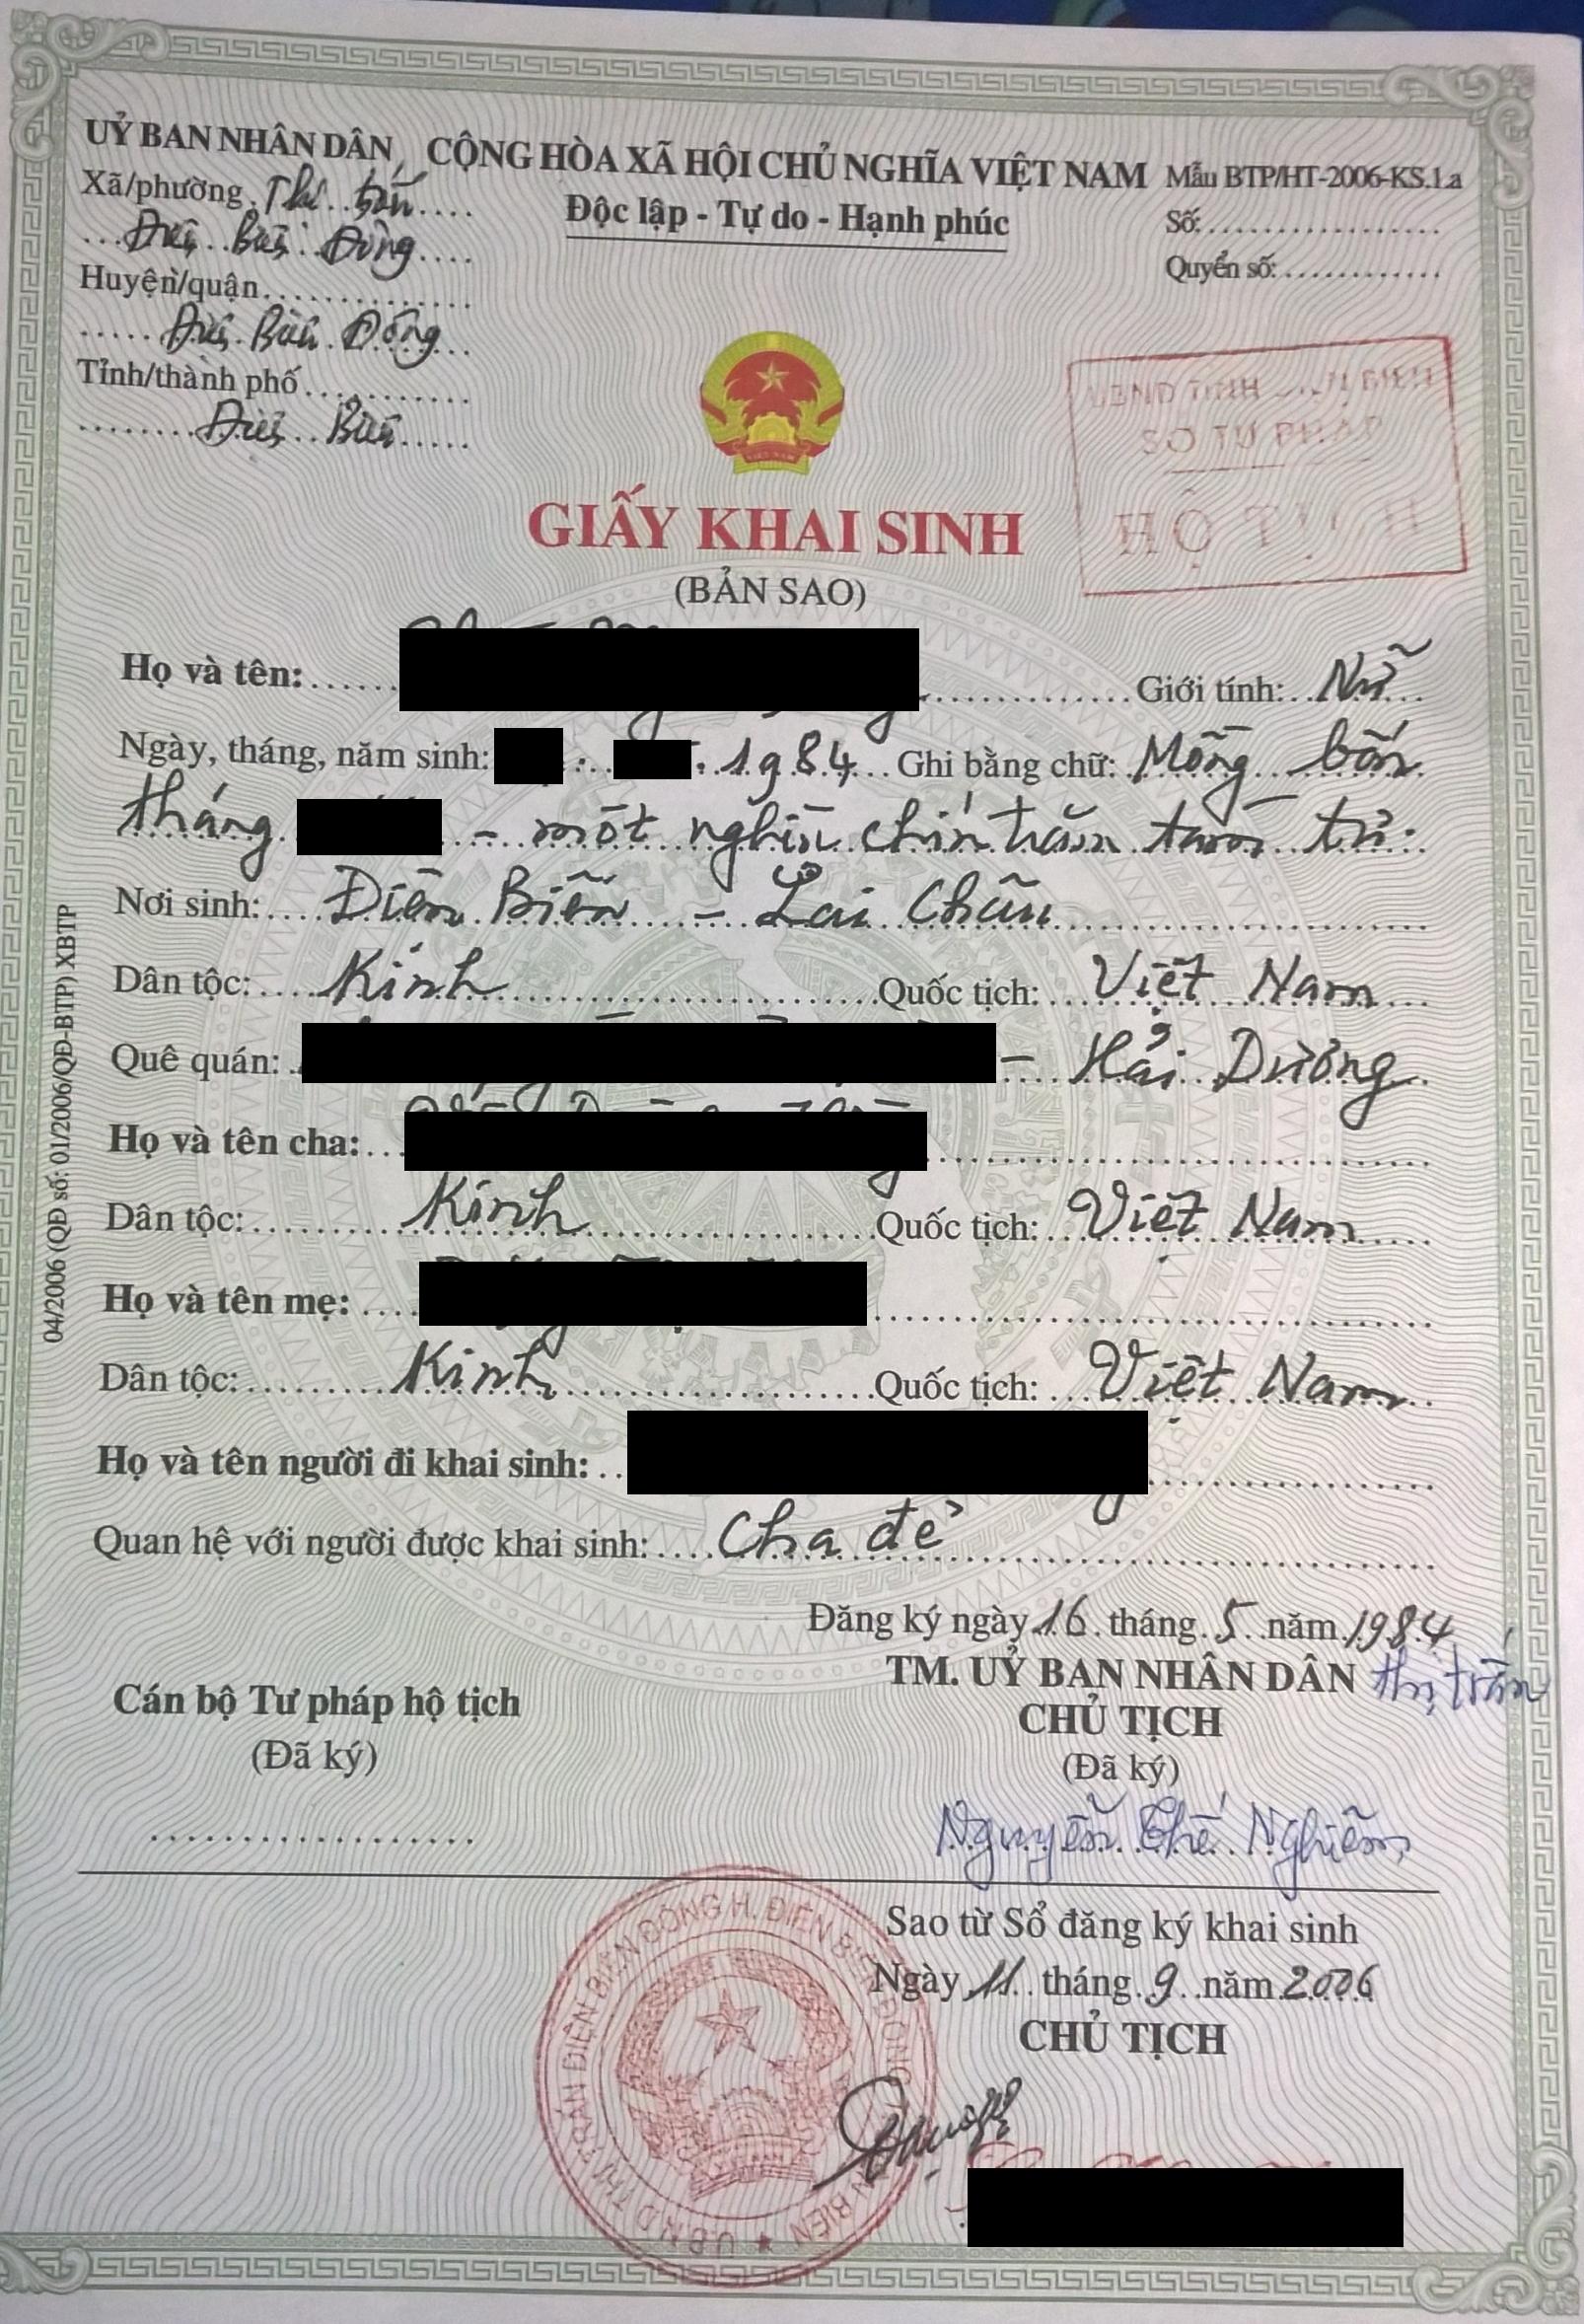 Filevietnamese birth certificate 1984 ag wikimedia commons filevietnamese birth certificate 1984 ag aiddatafo Choice Image